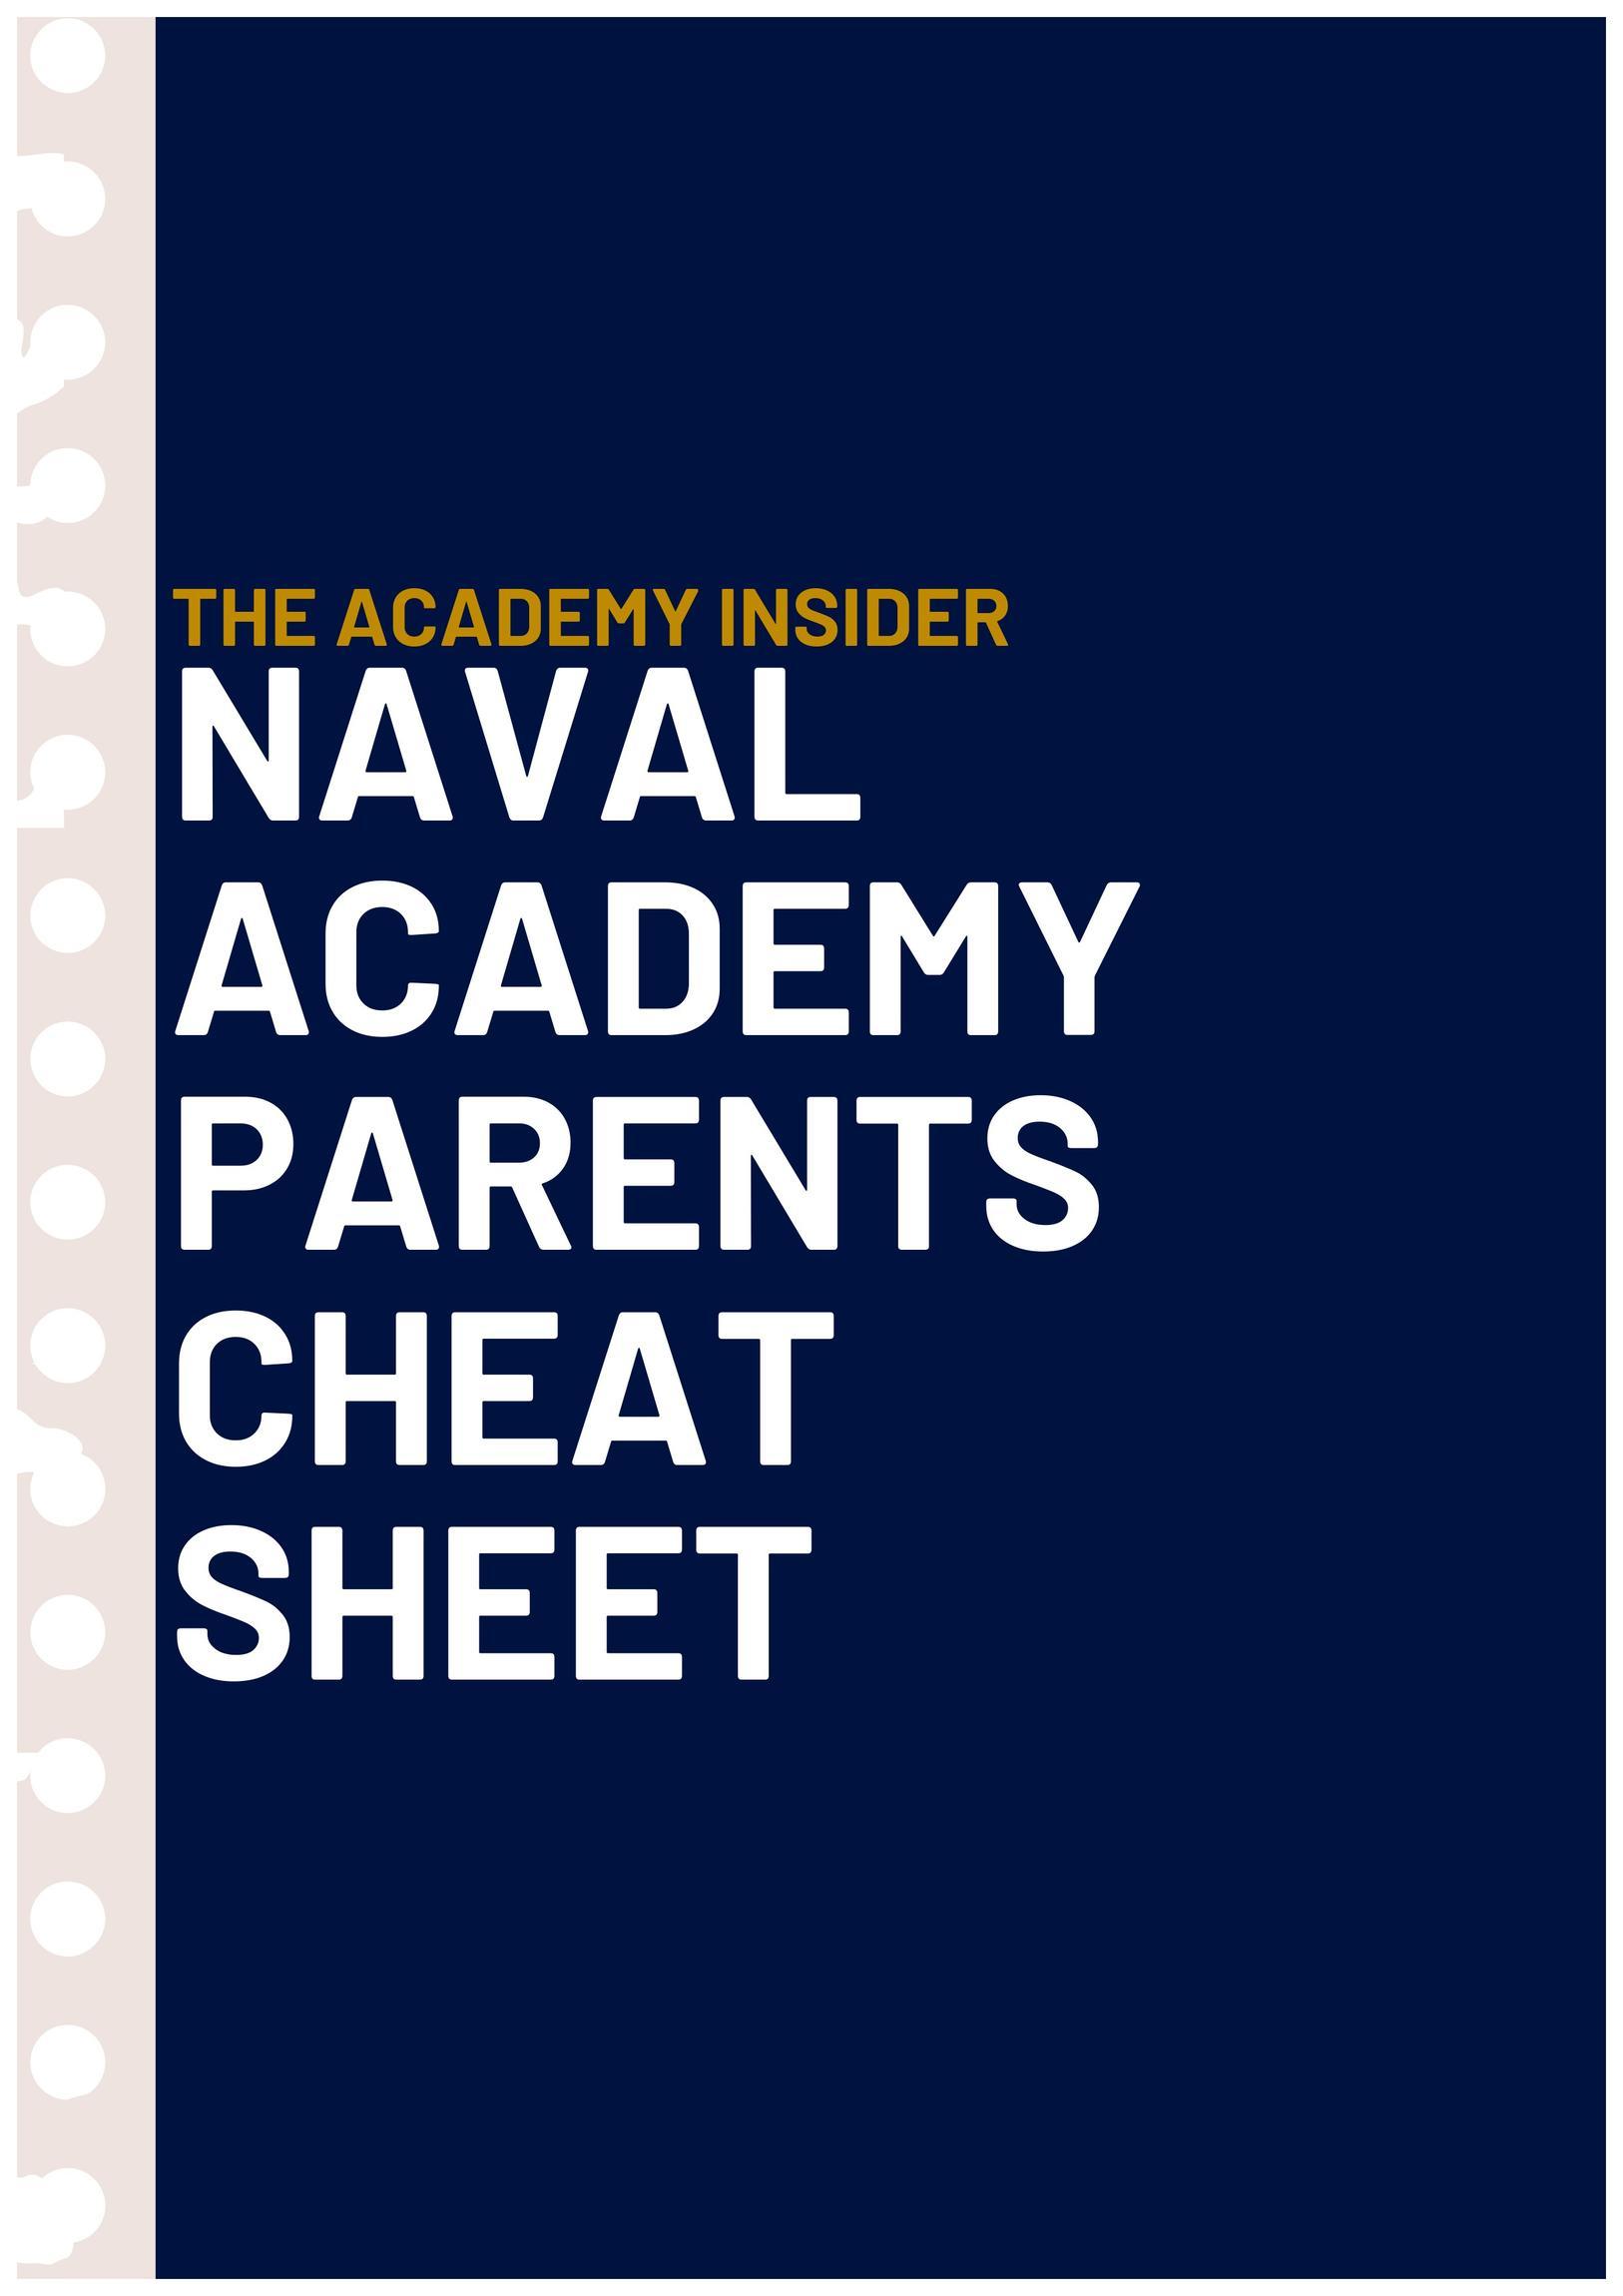 The Academy Insider